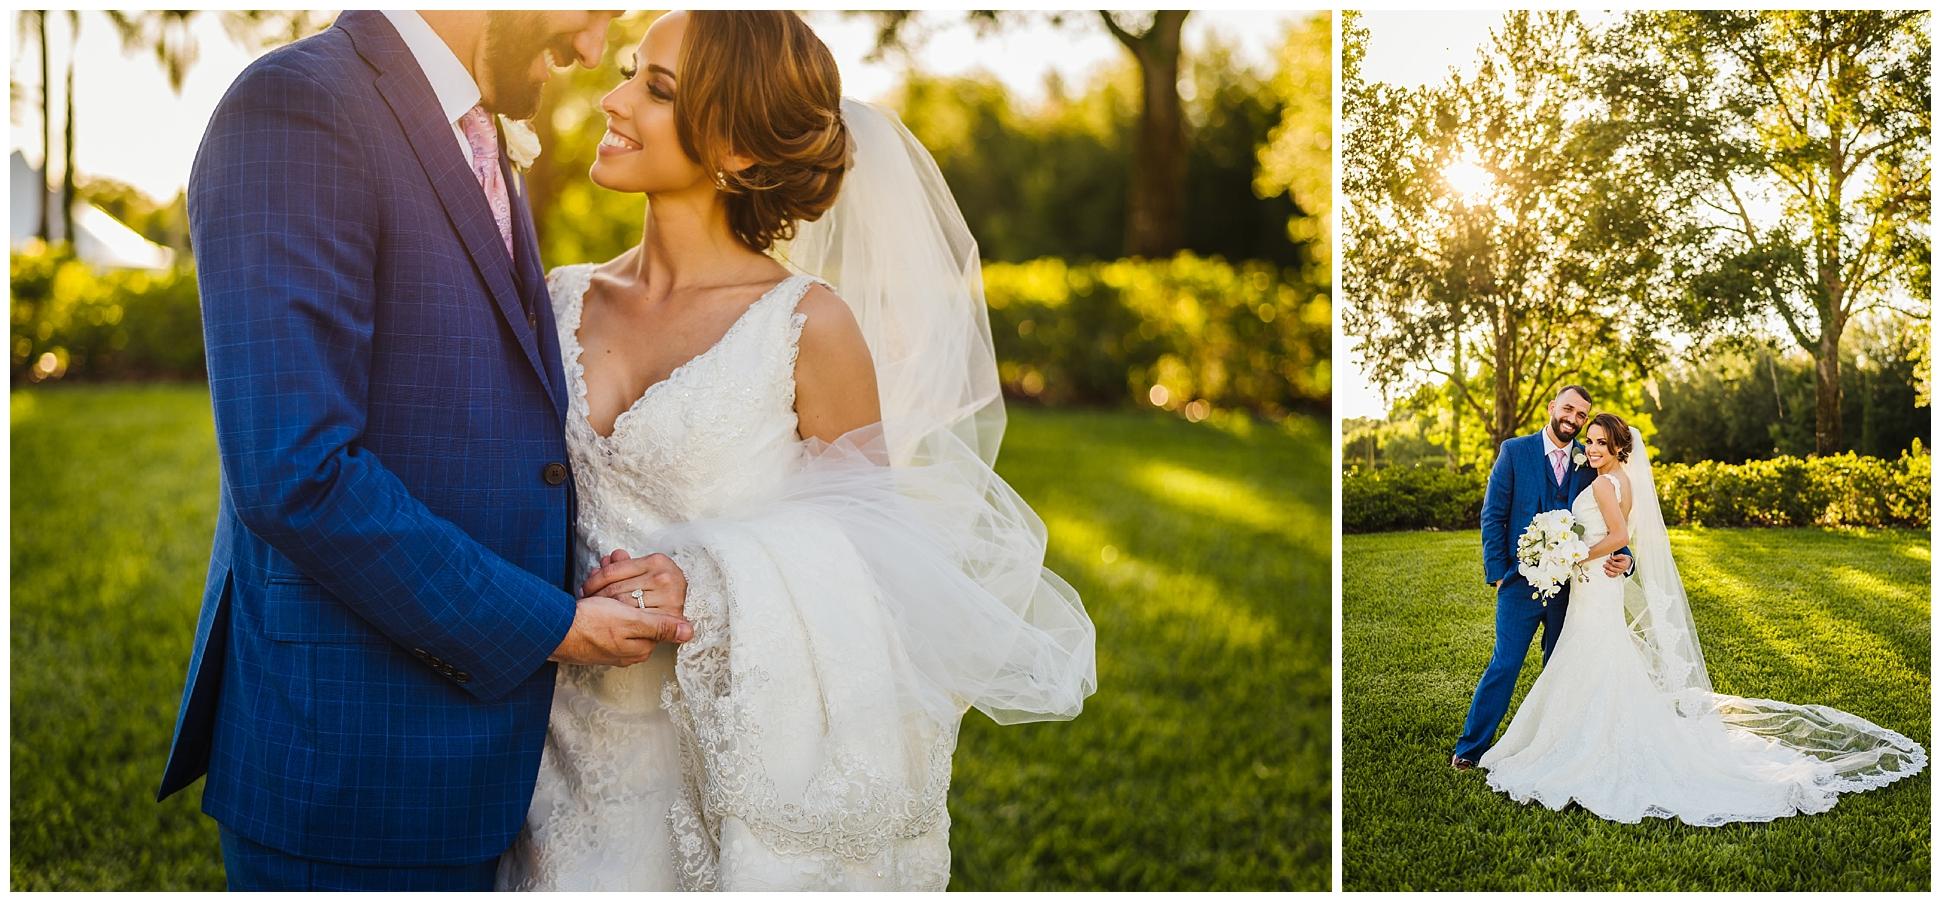 Tampa-luxury-wedding-photographer-mision-lago-private-estate_0042.jpg